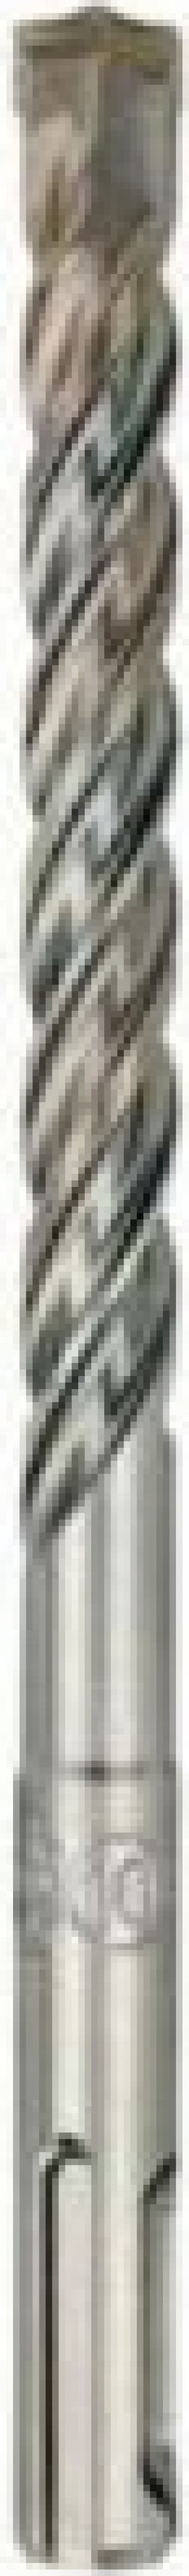 Burghiu SDS-plus EXTREME 2 4x100x150 mm Dewalt Accesorii masini de gaurit